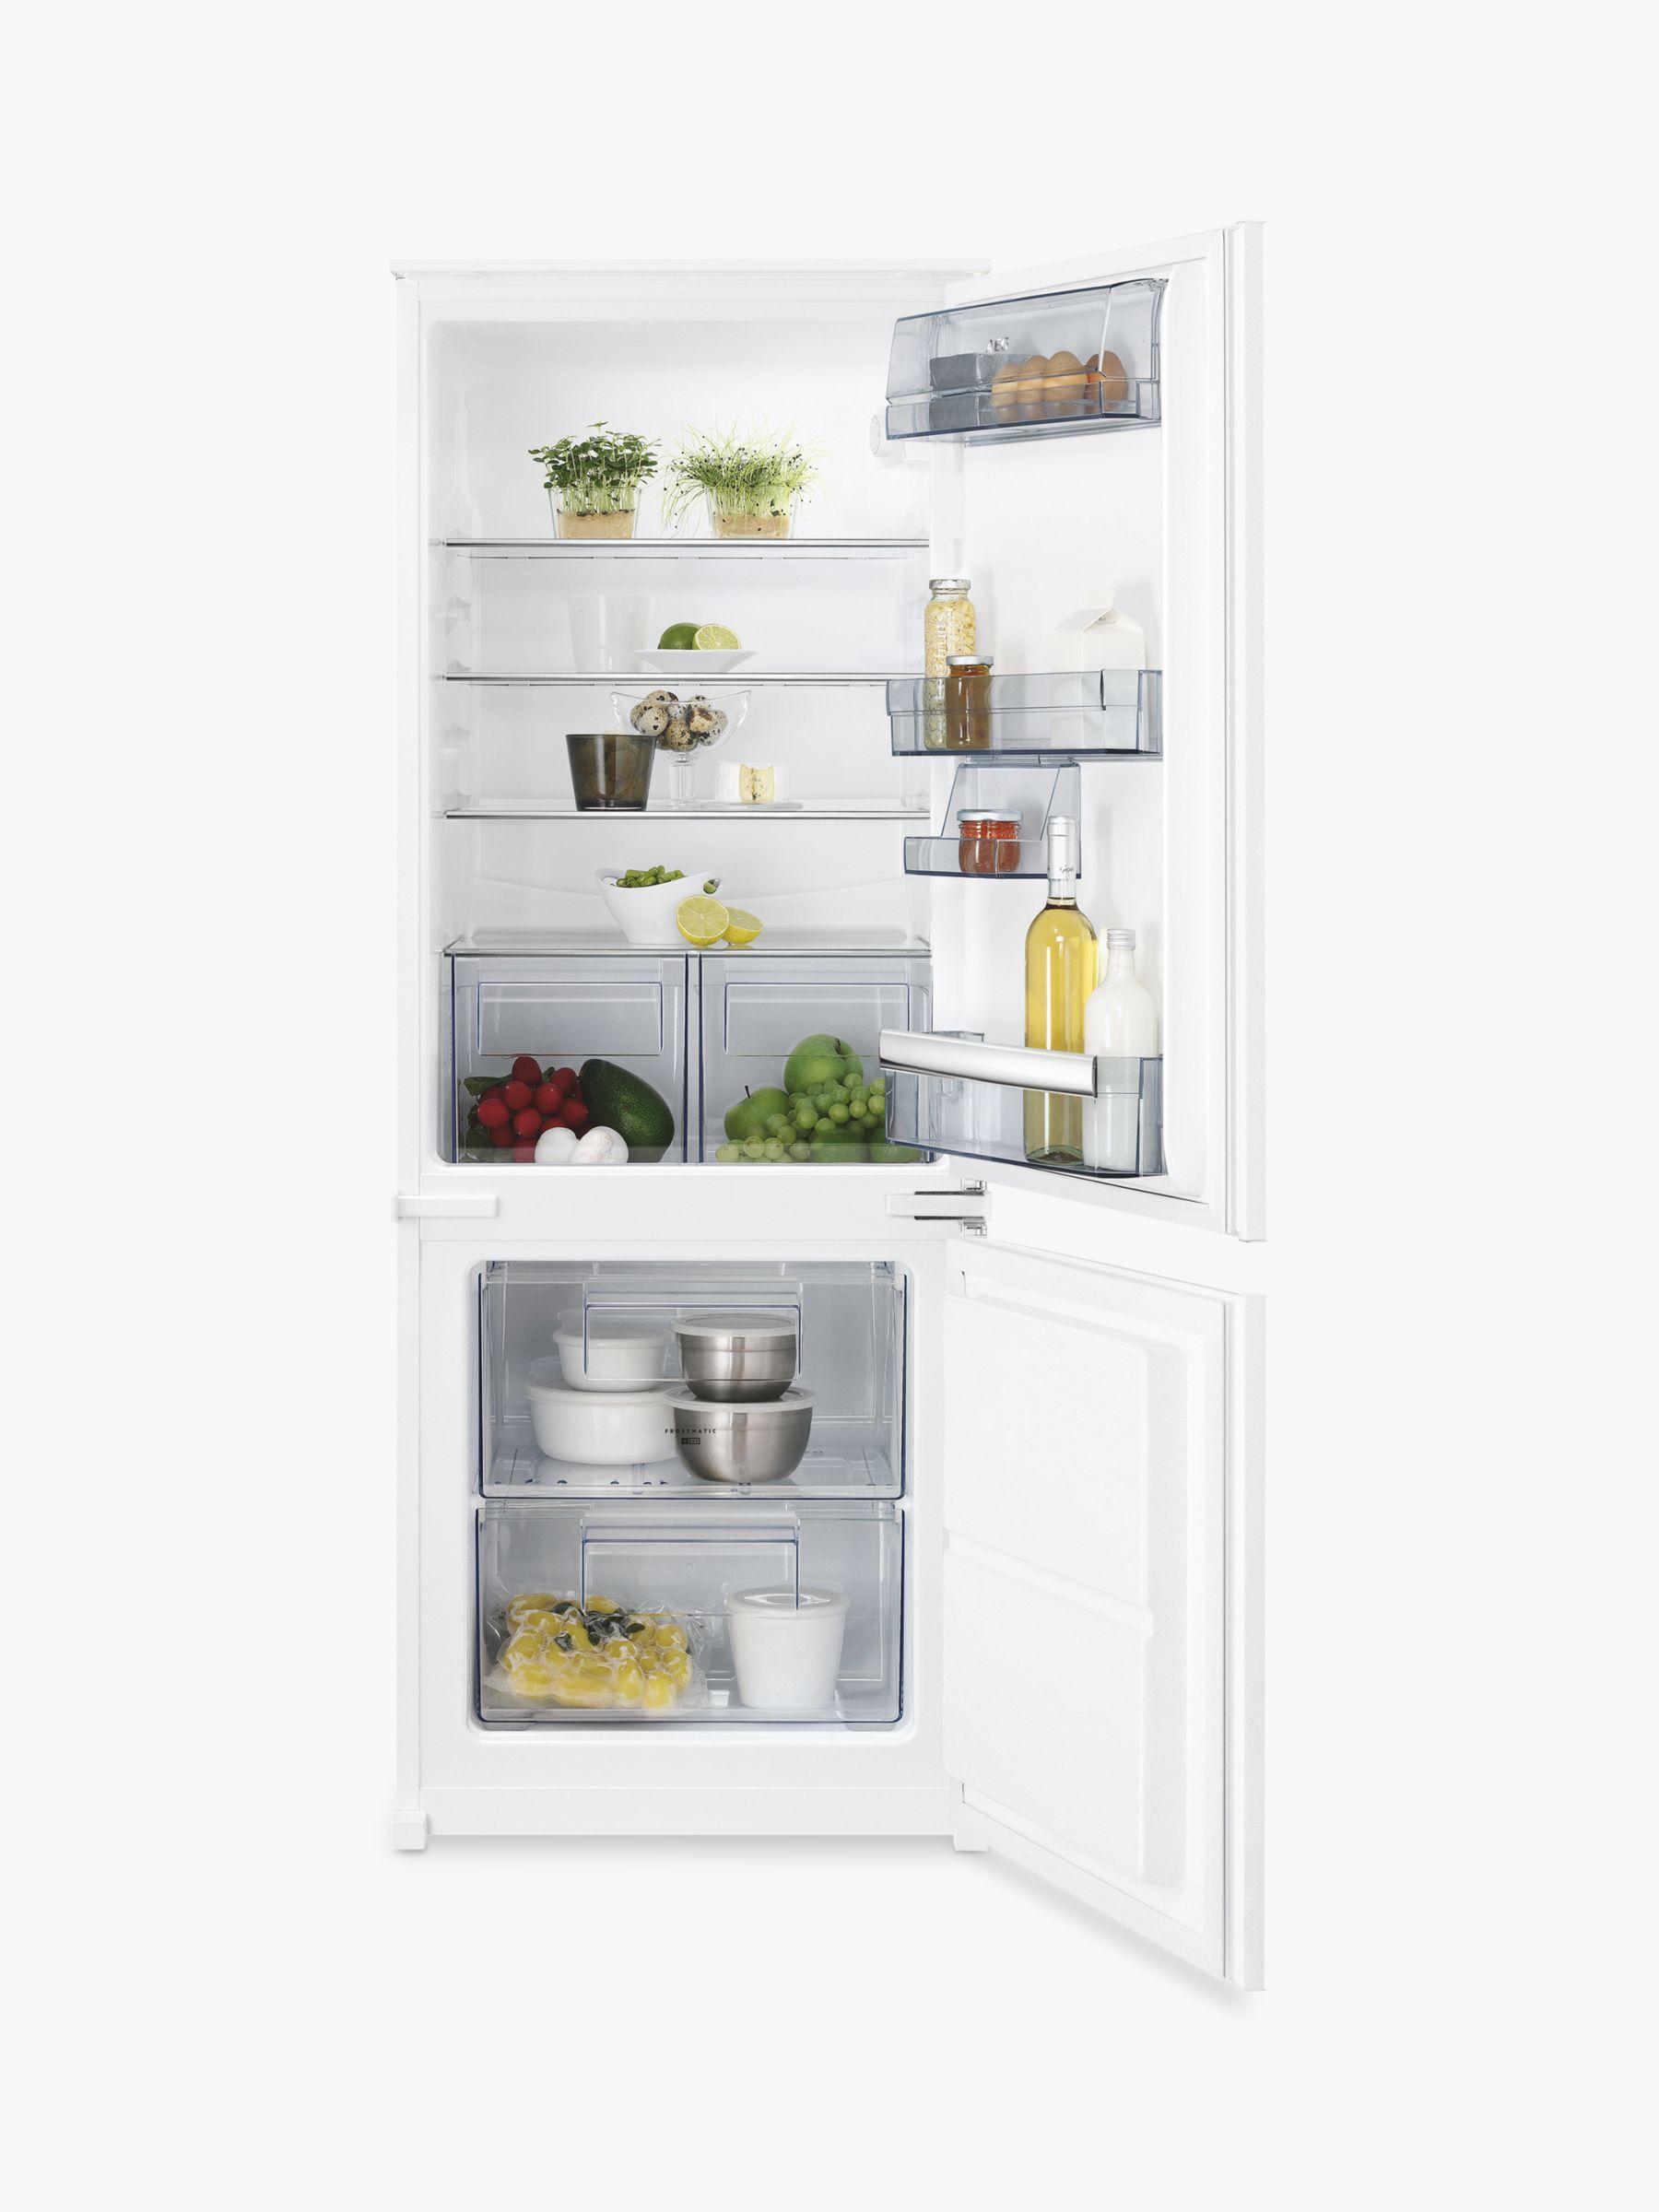 AEG AEG SCB5142VLS Integrated Fridge Freezer, A++ Energy Rating, 54cm, White